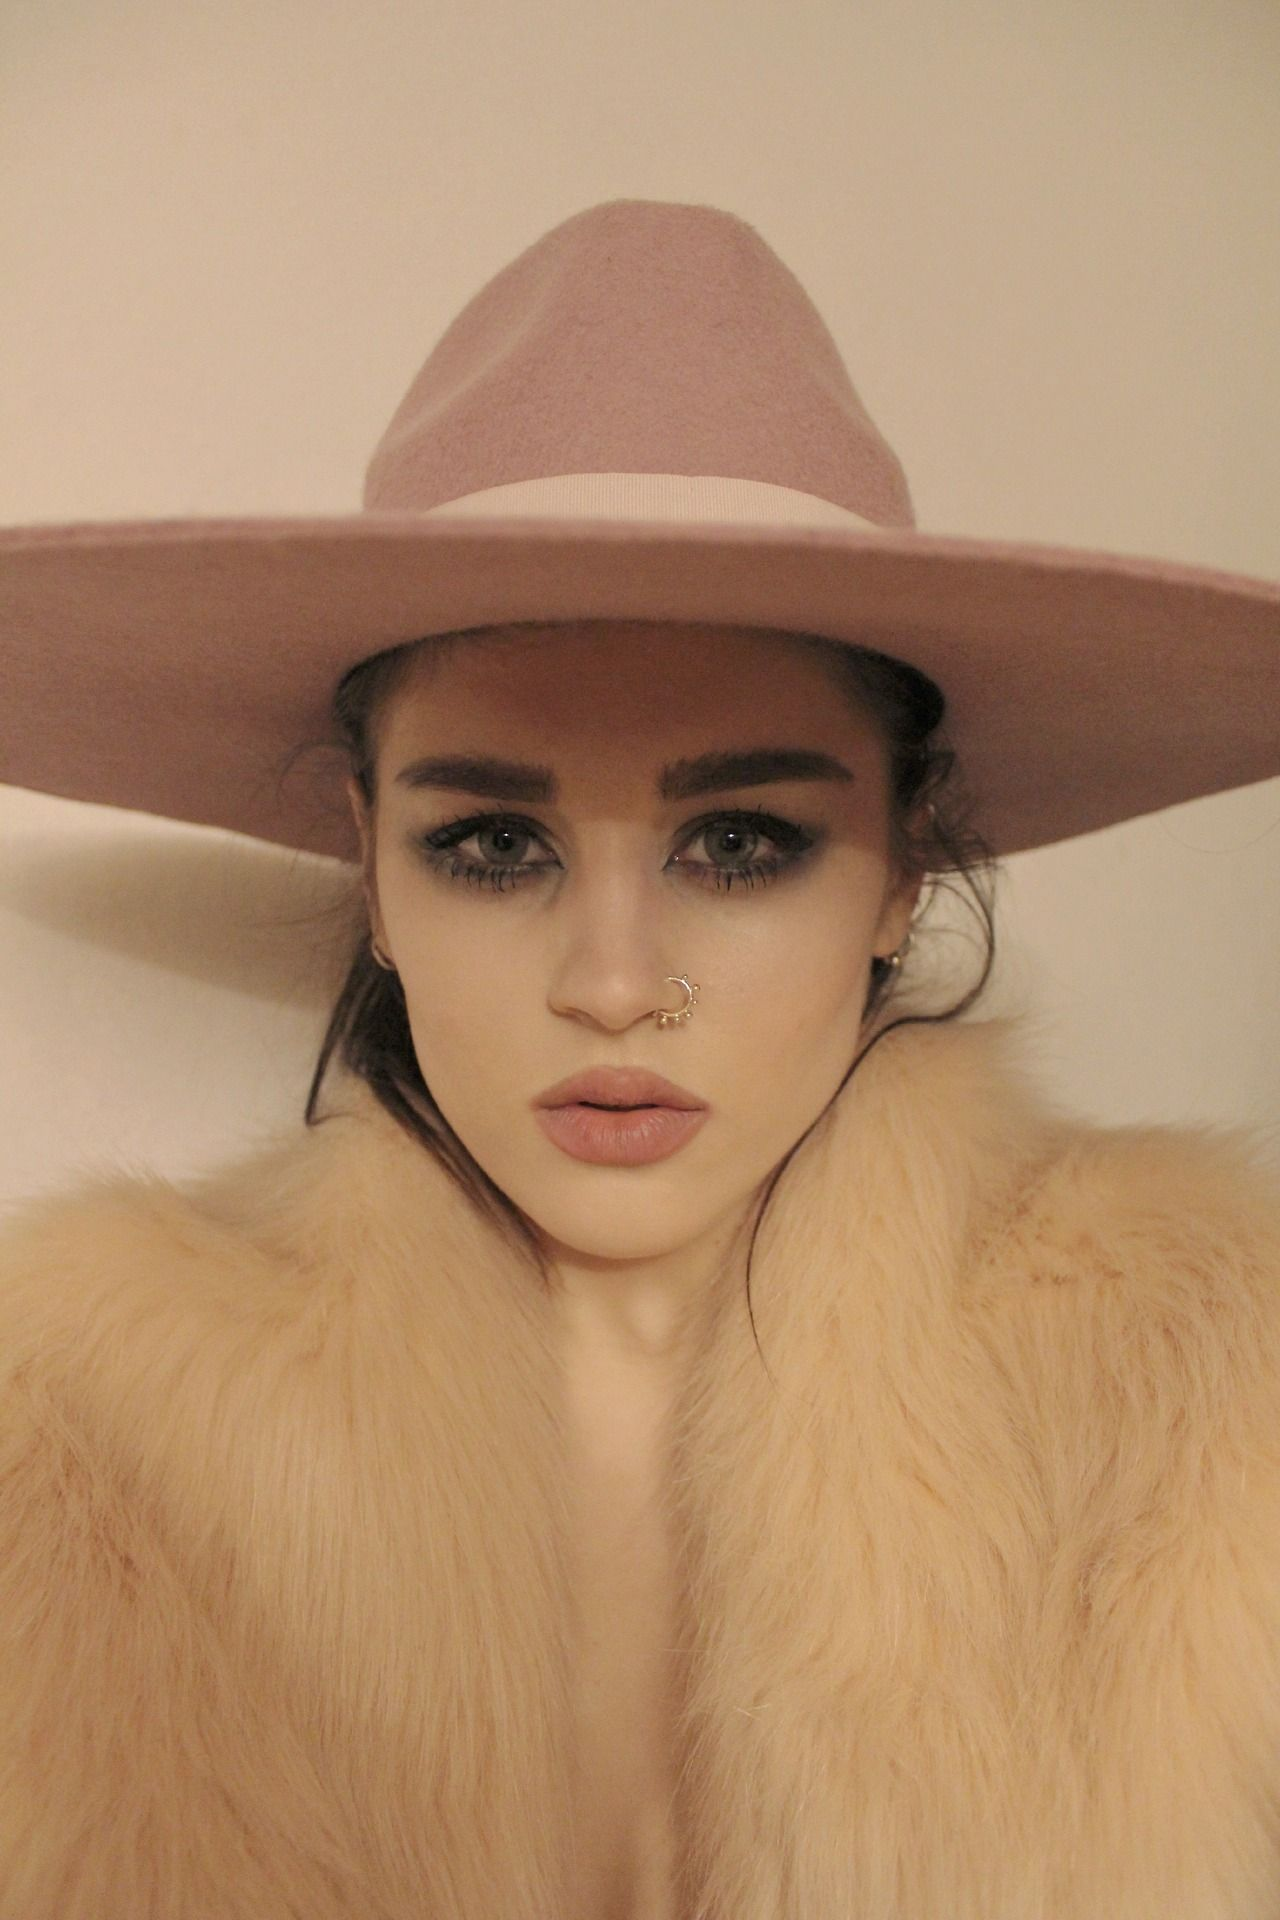 boho babe - love the makeup and hat | Boho Chic | Fashion ...